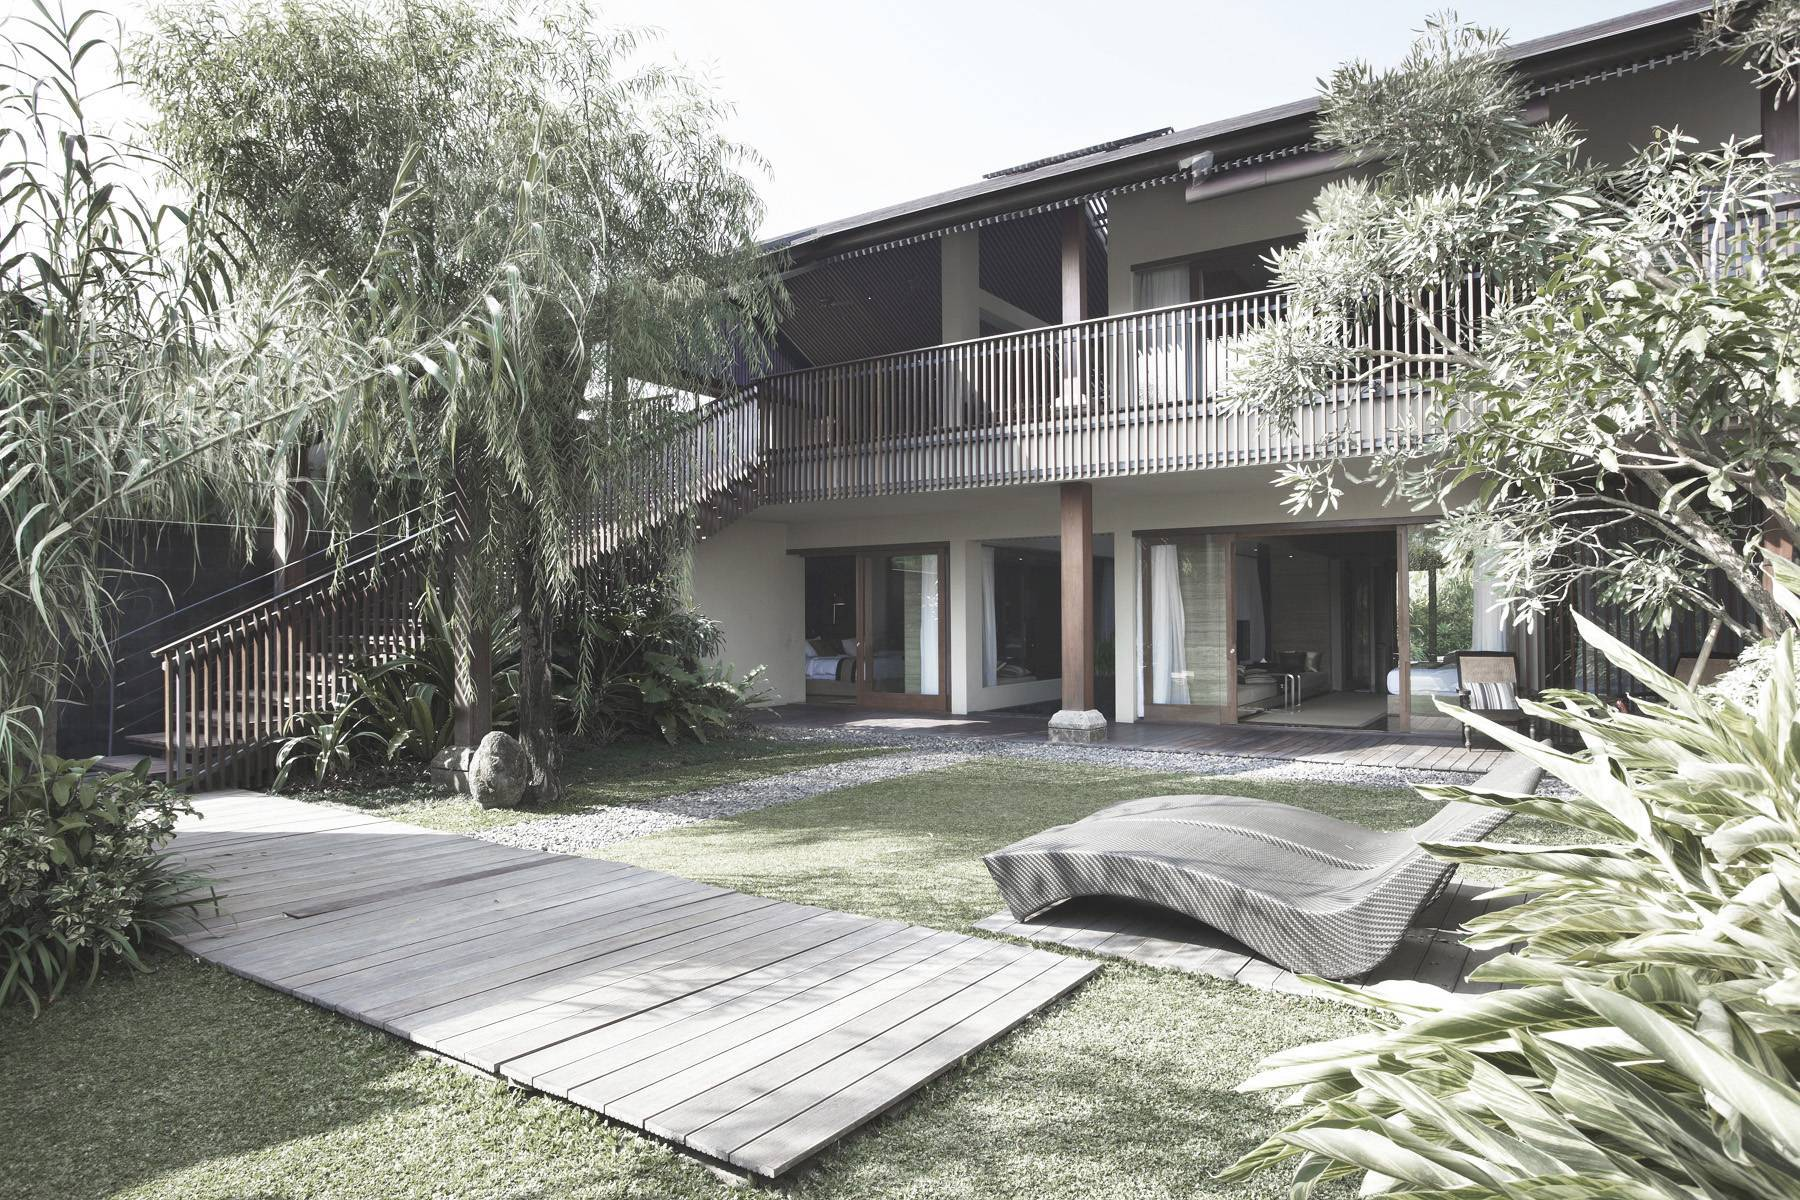 Antony Liu + Ferry Ridwan / Studio Tonton Ametis Villa Canggu, Bali Canggu, Bali Courtyard Modern  7981